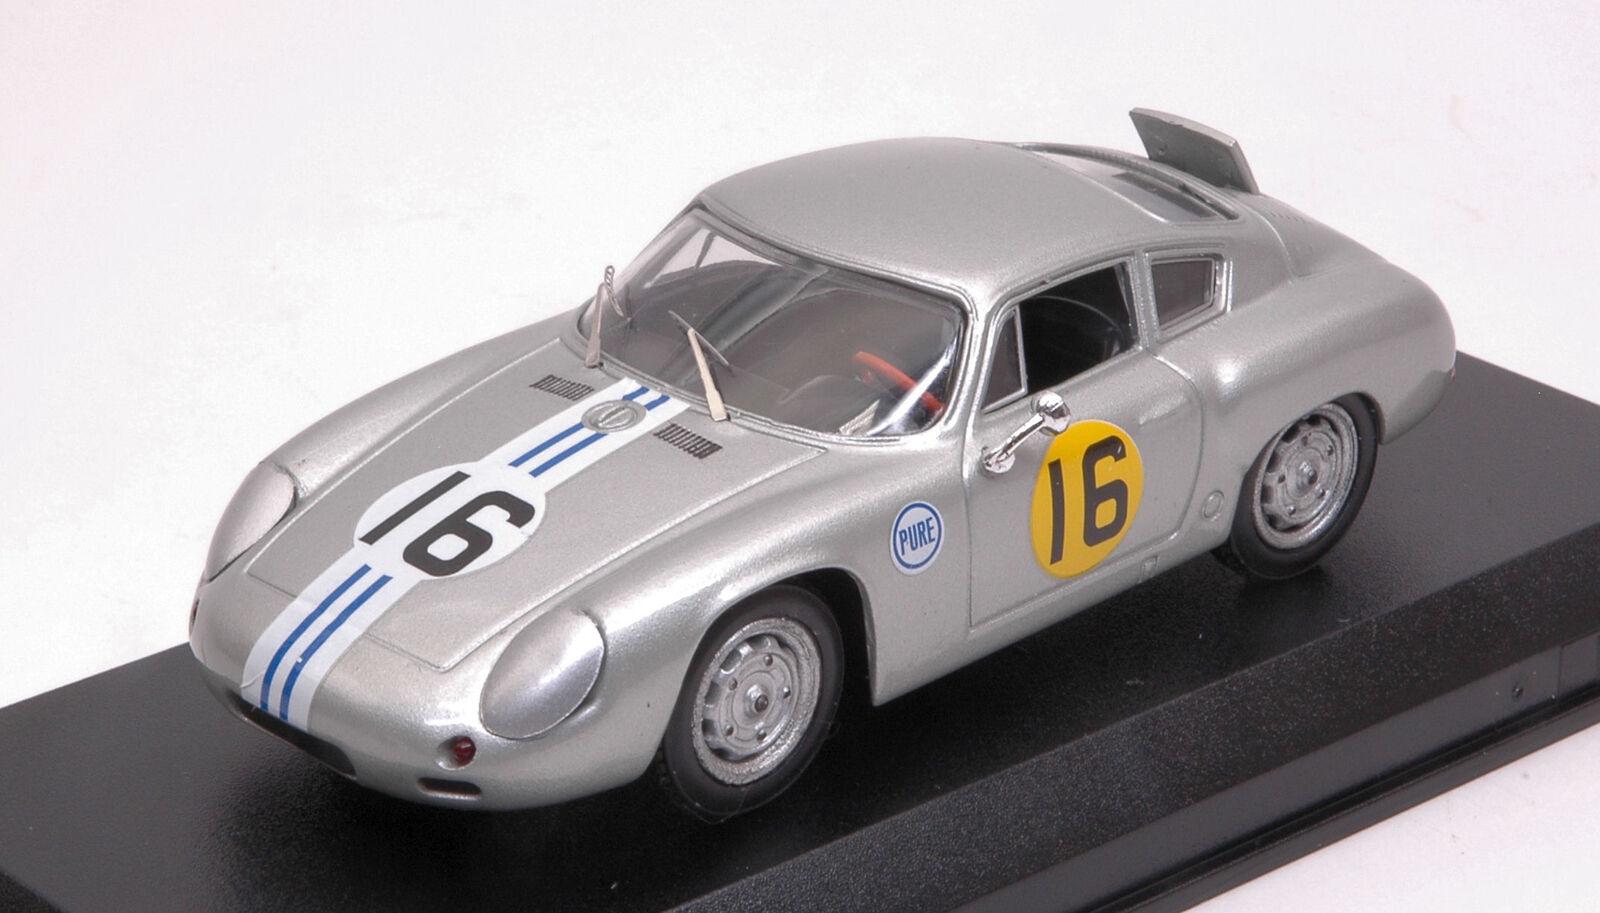 Porsche 356 B Abarth Abarth Abarth  16 Winner classe 3 H Daytona 1963 C. Cassel 1 43 modello 20955a